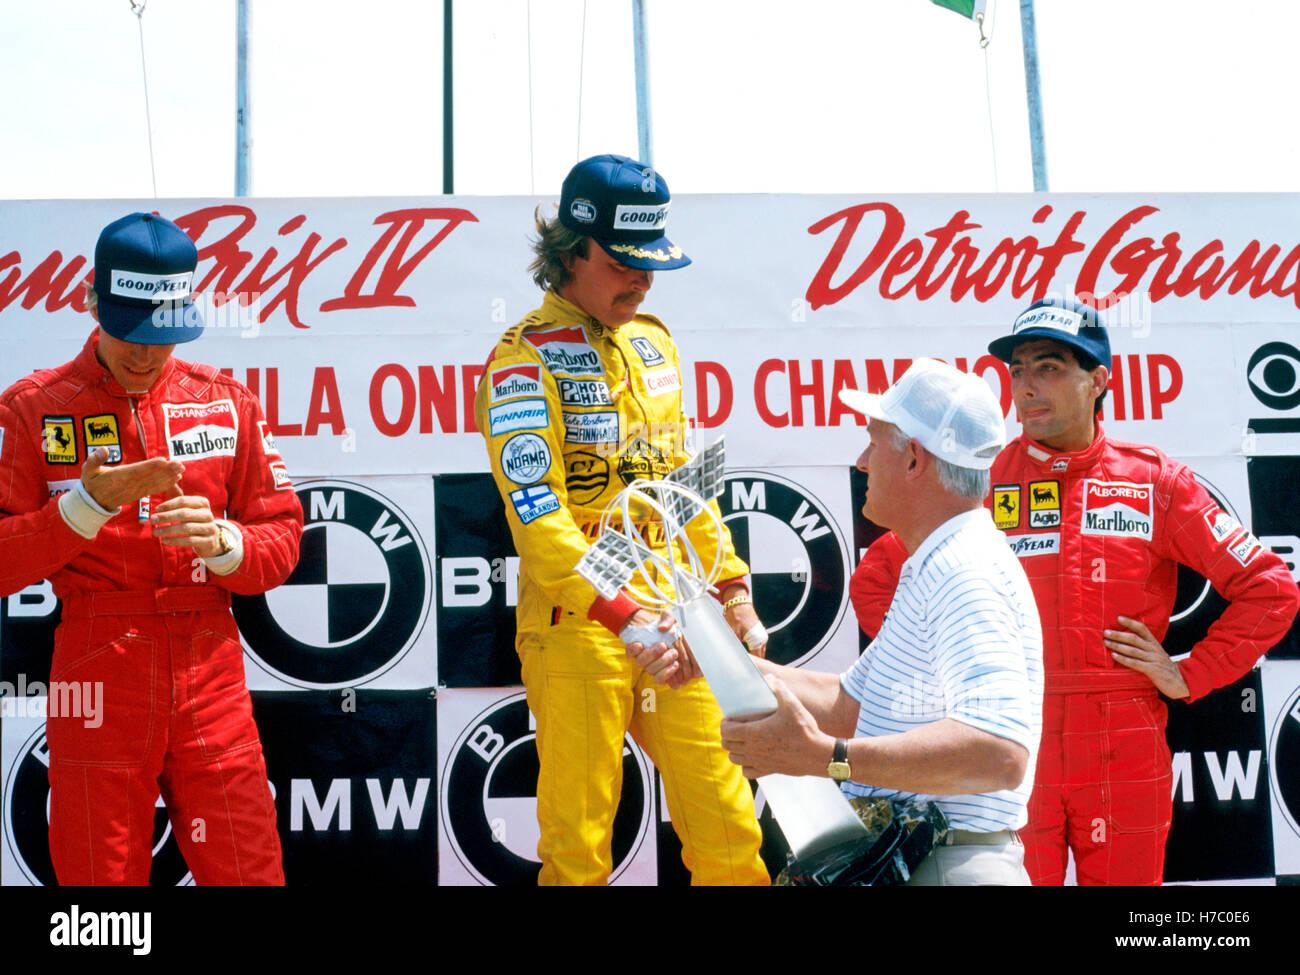 Keke Rosberg gewinnt Detroit 1985 - Stefan Johansson 2. Michele Alboreto  3rd Stockfotografie - Alamy